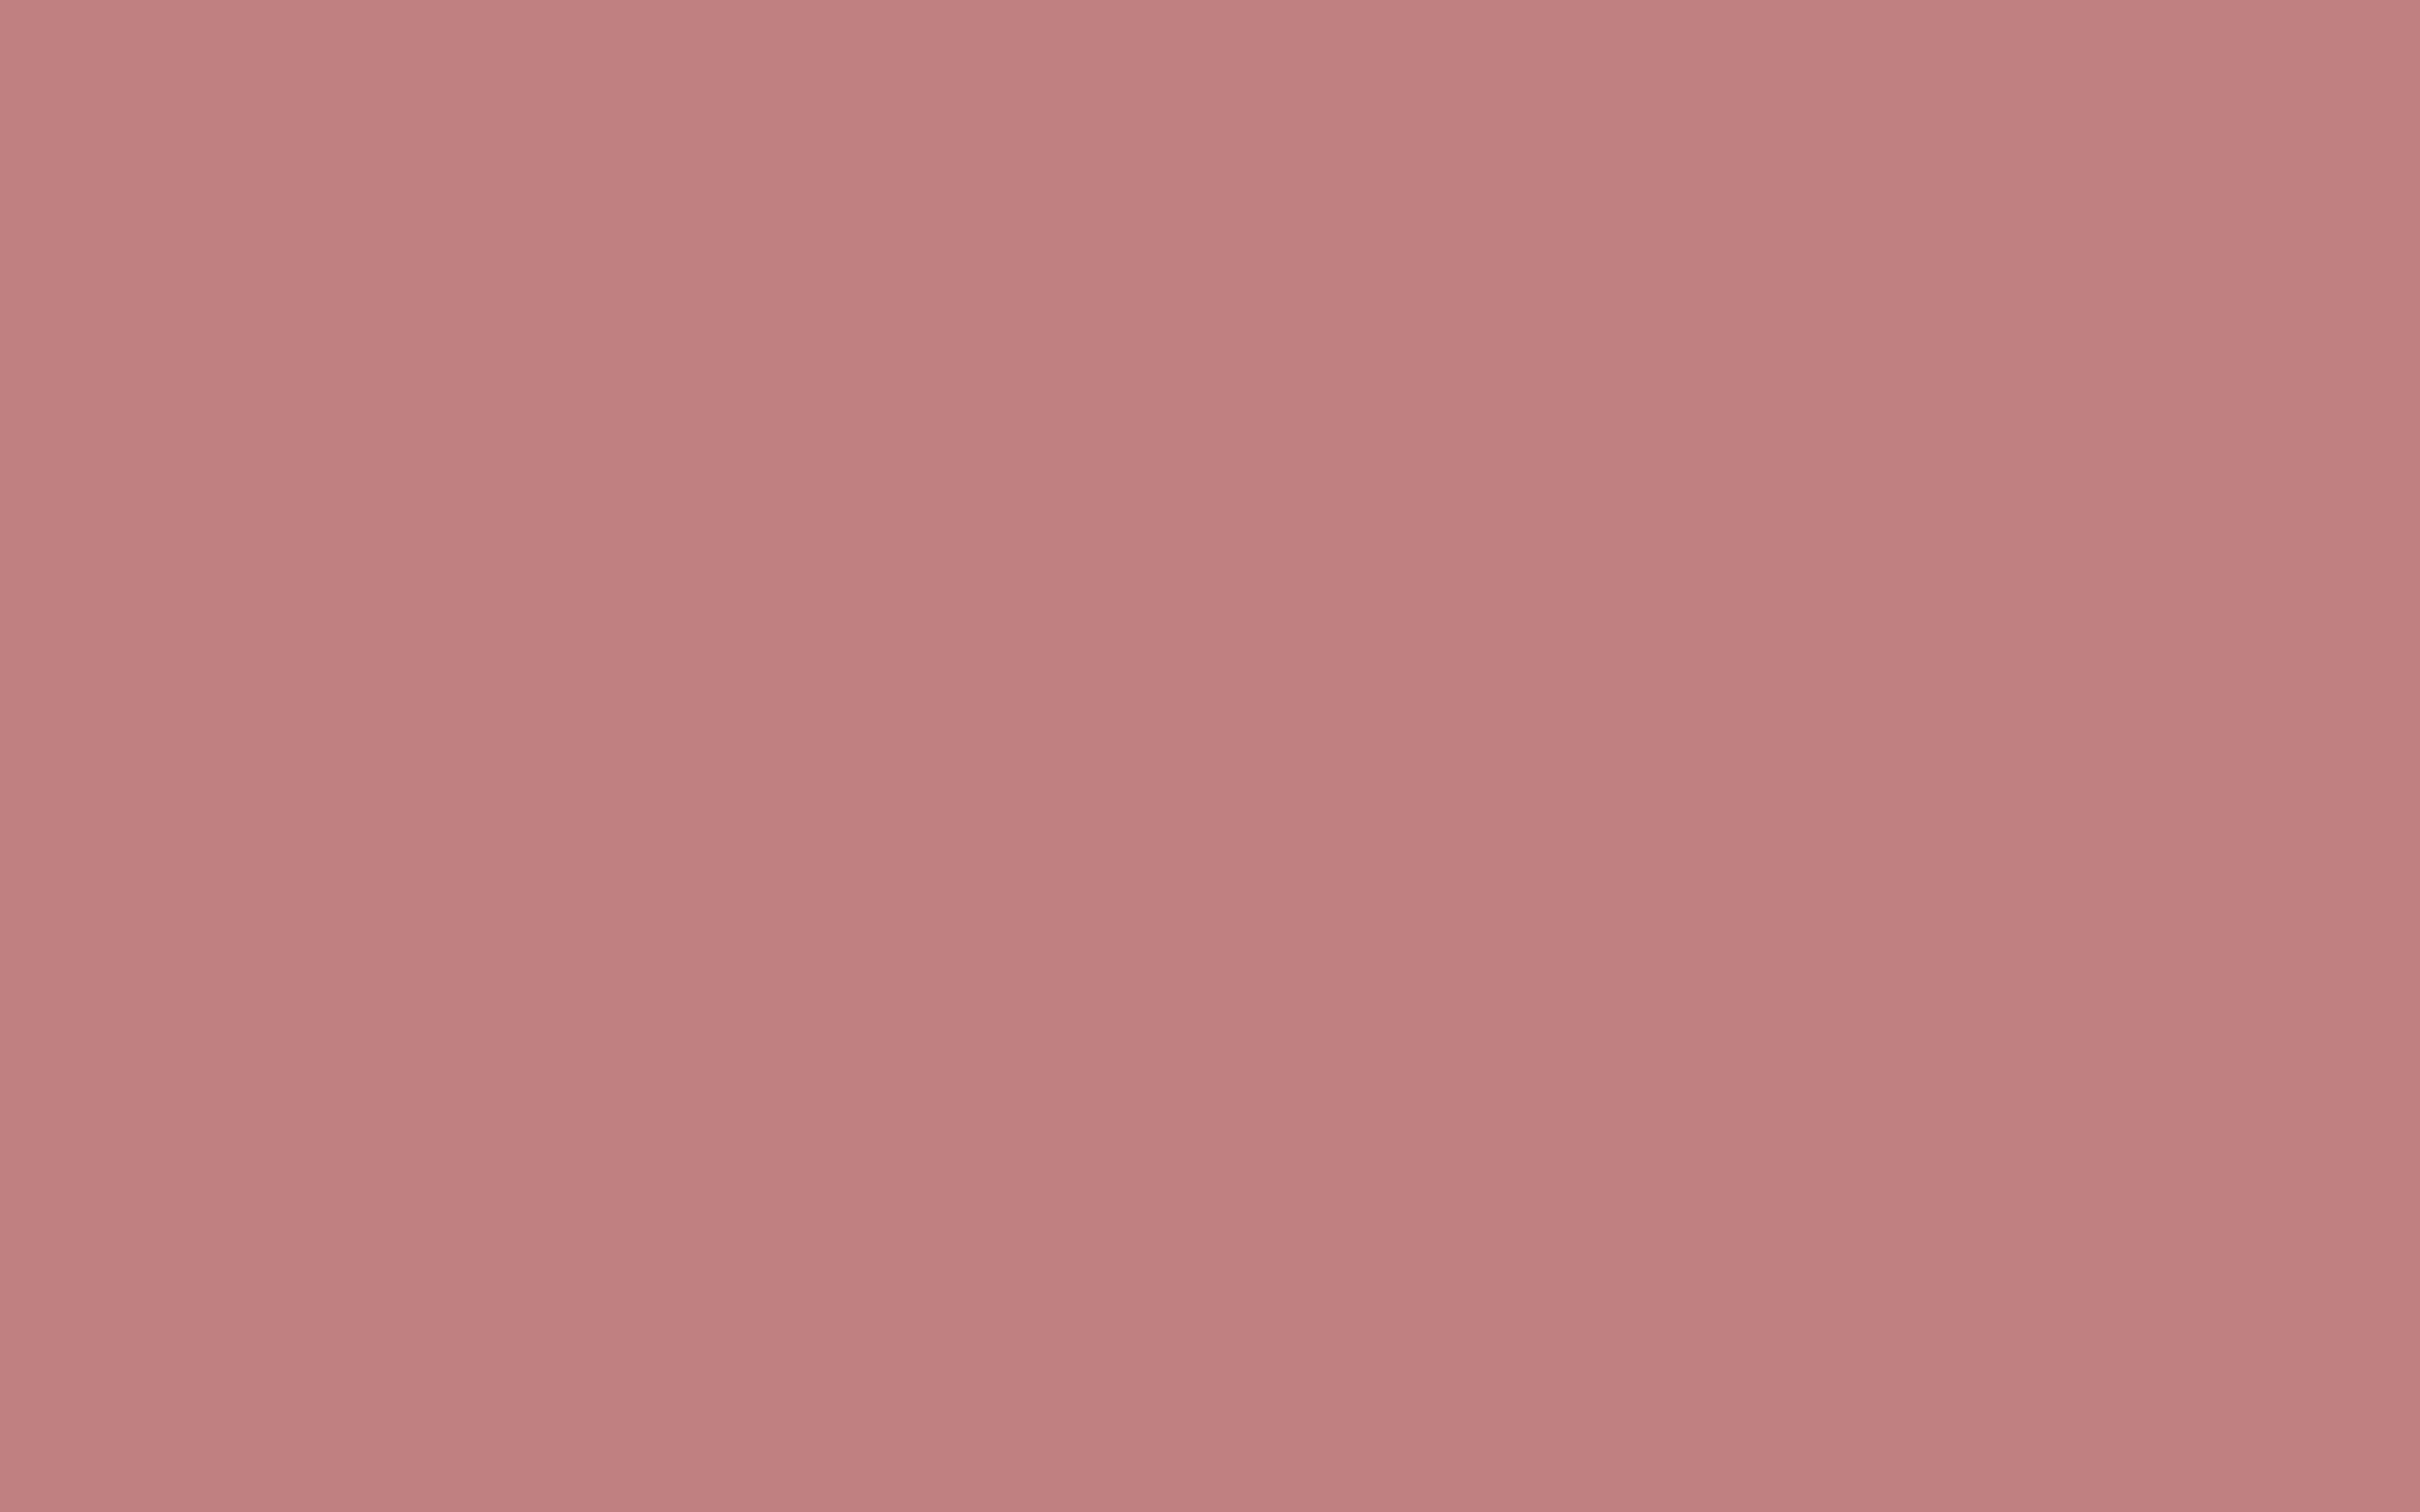 2560x1600 Old Rose Solid Color Background